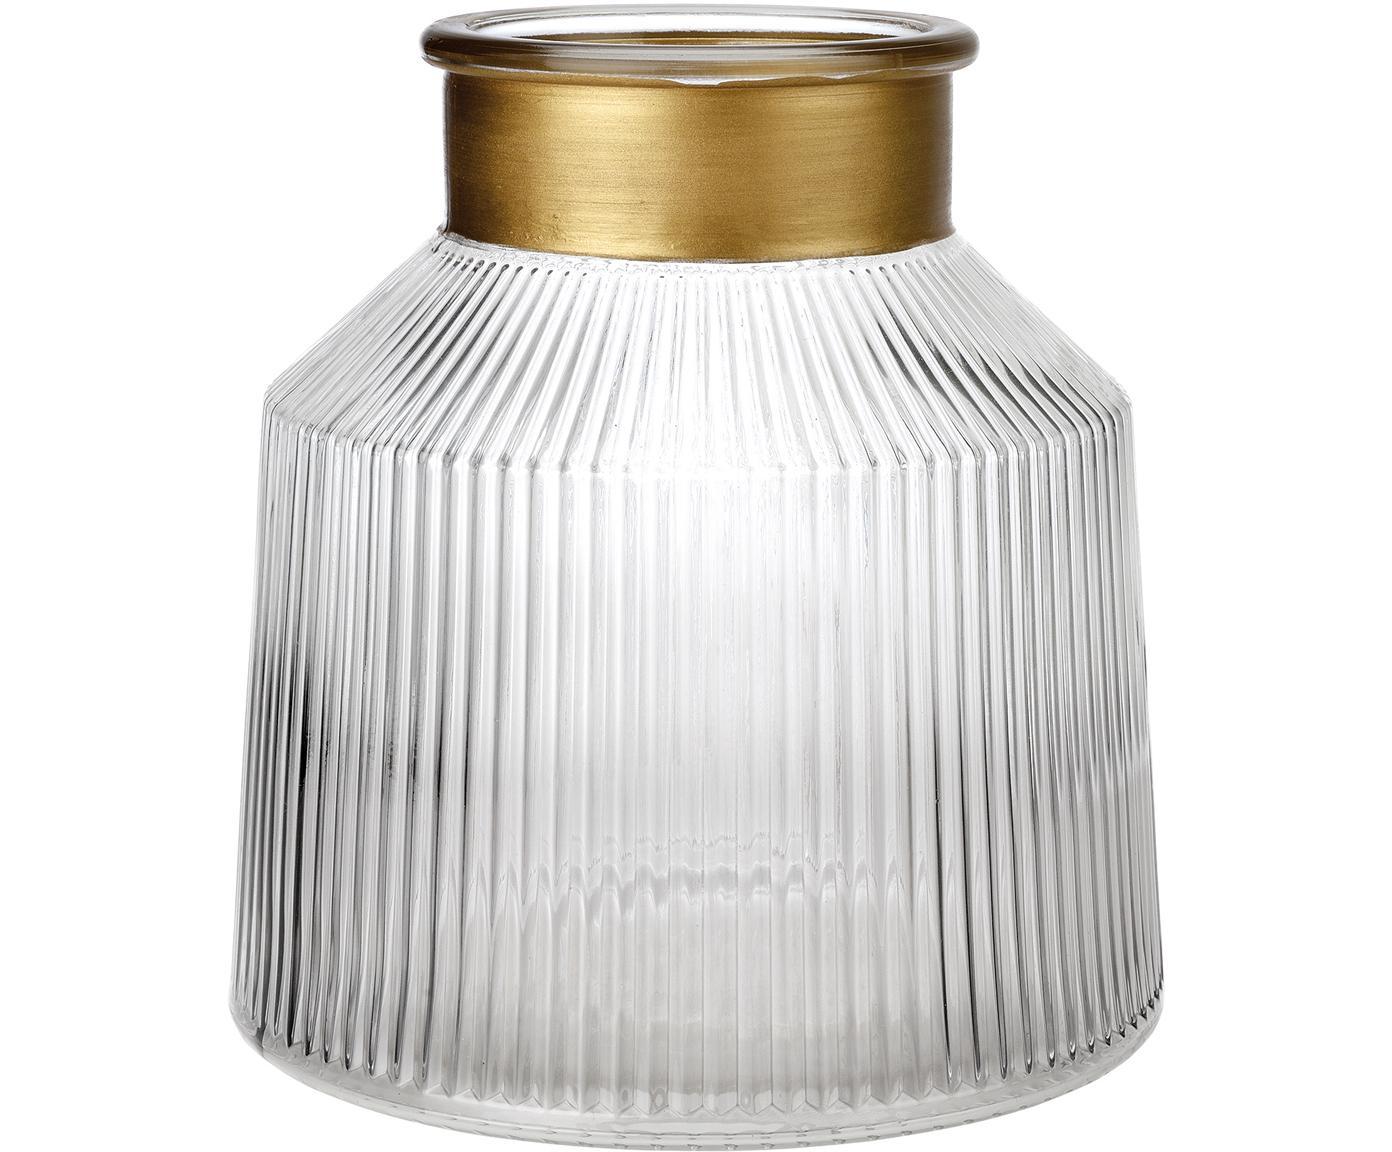 Glas-Vase Junyell, Rand: Glas, lackiert, Vase: Glas, Goldfarben, Transparent, Ø 19 x H 20 cm